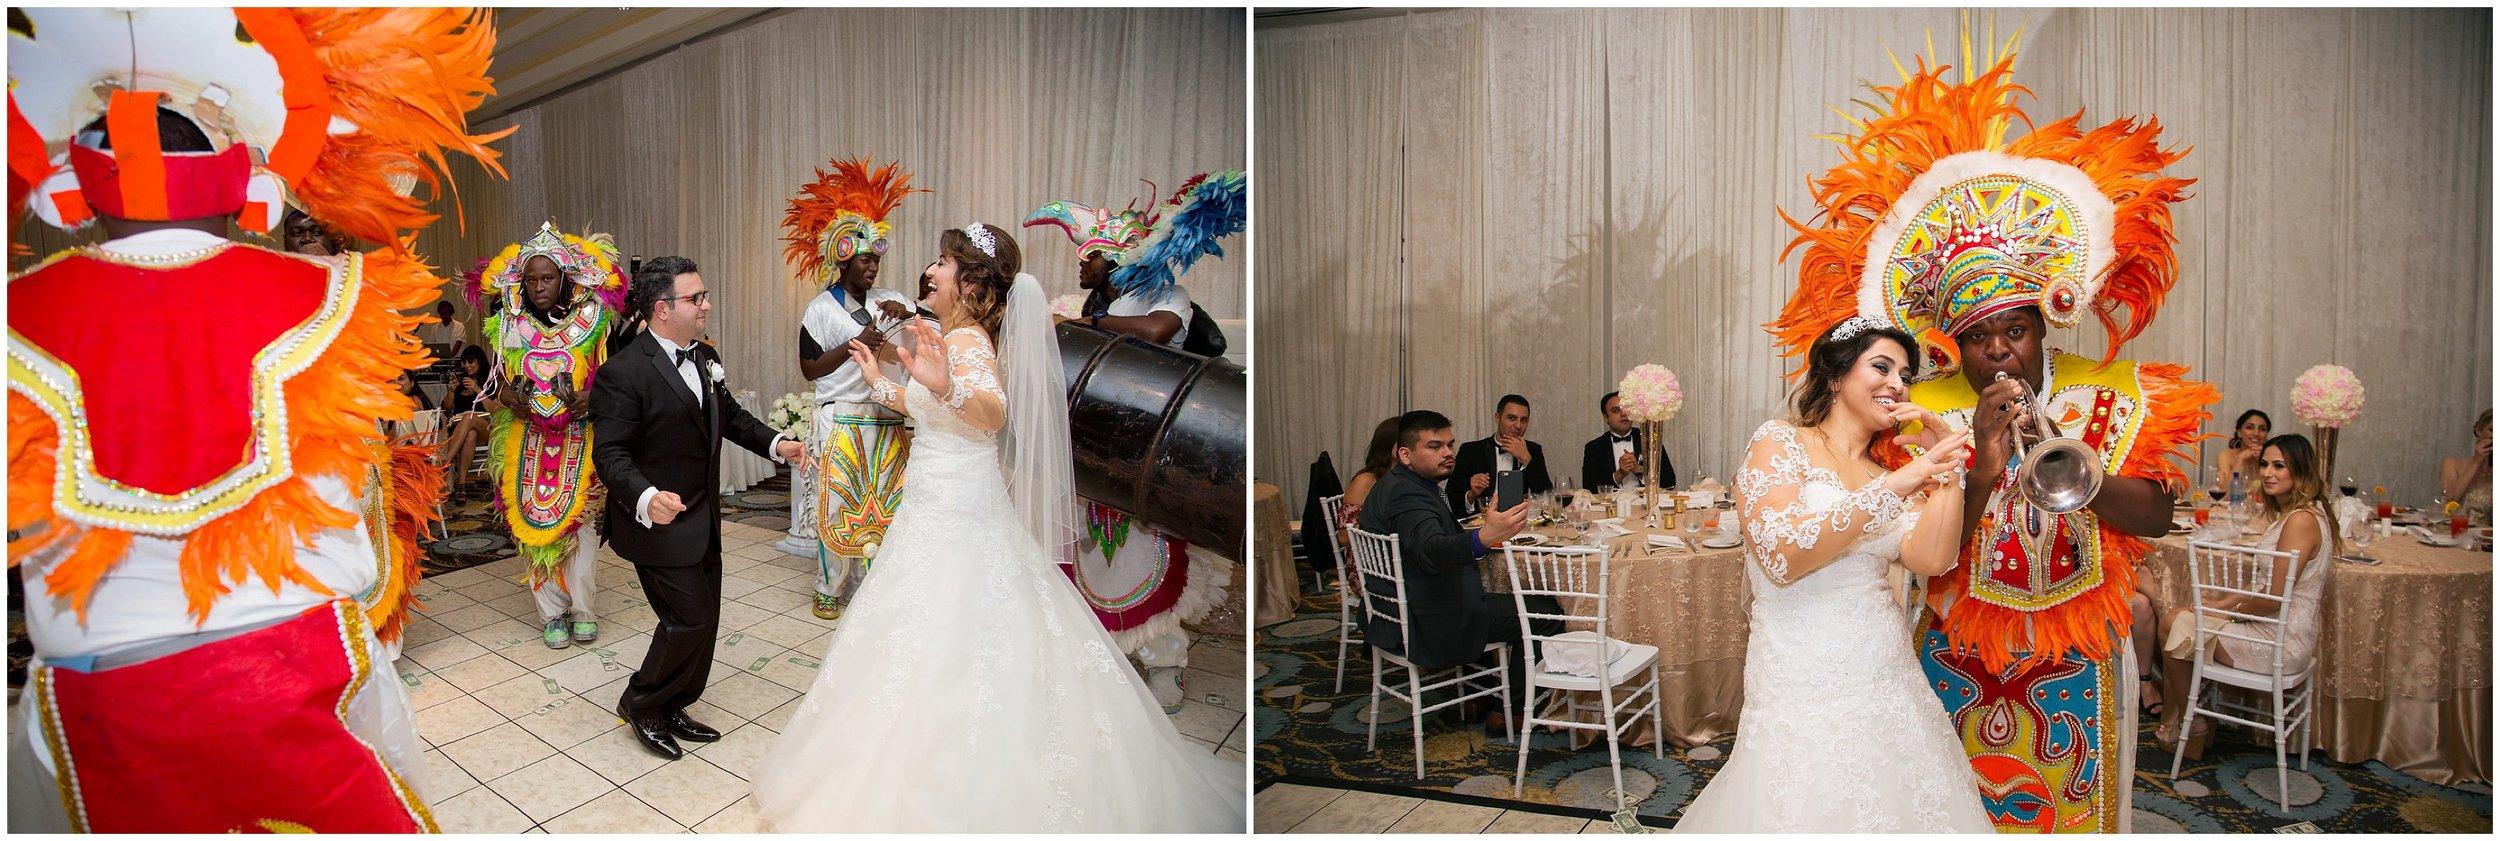 Le Cape Weddings- Destination Wedding Photography -ShayanandNikkie-608-X3_LuxuryDestinationPhotographer.jpg